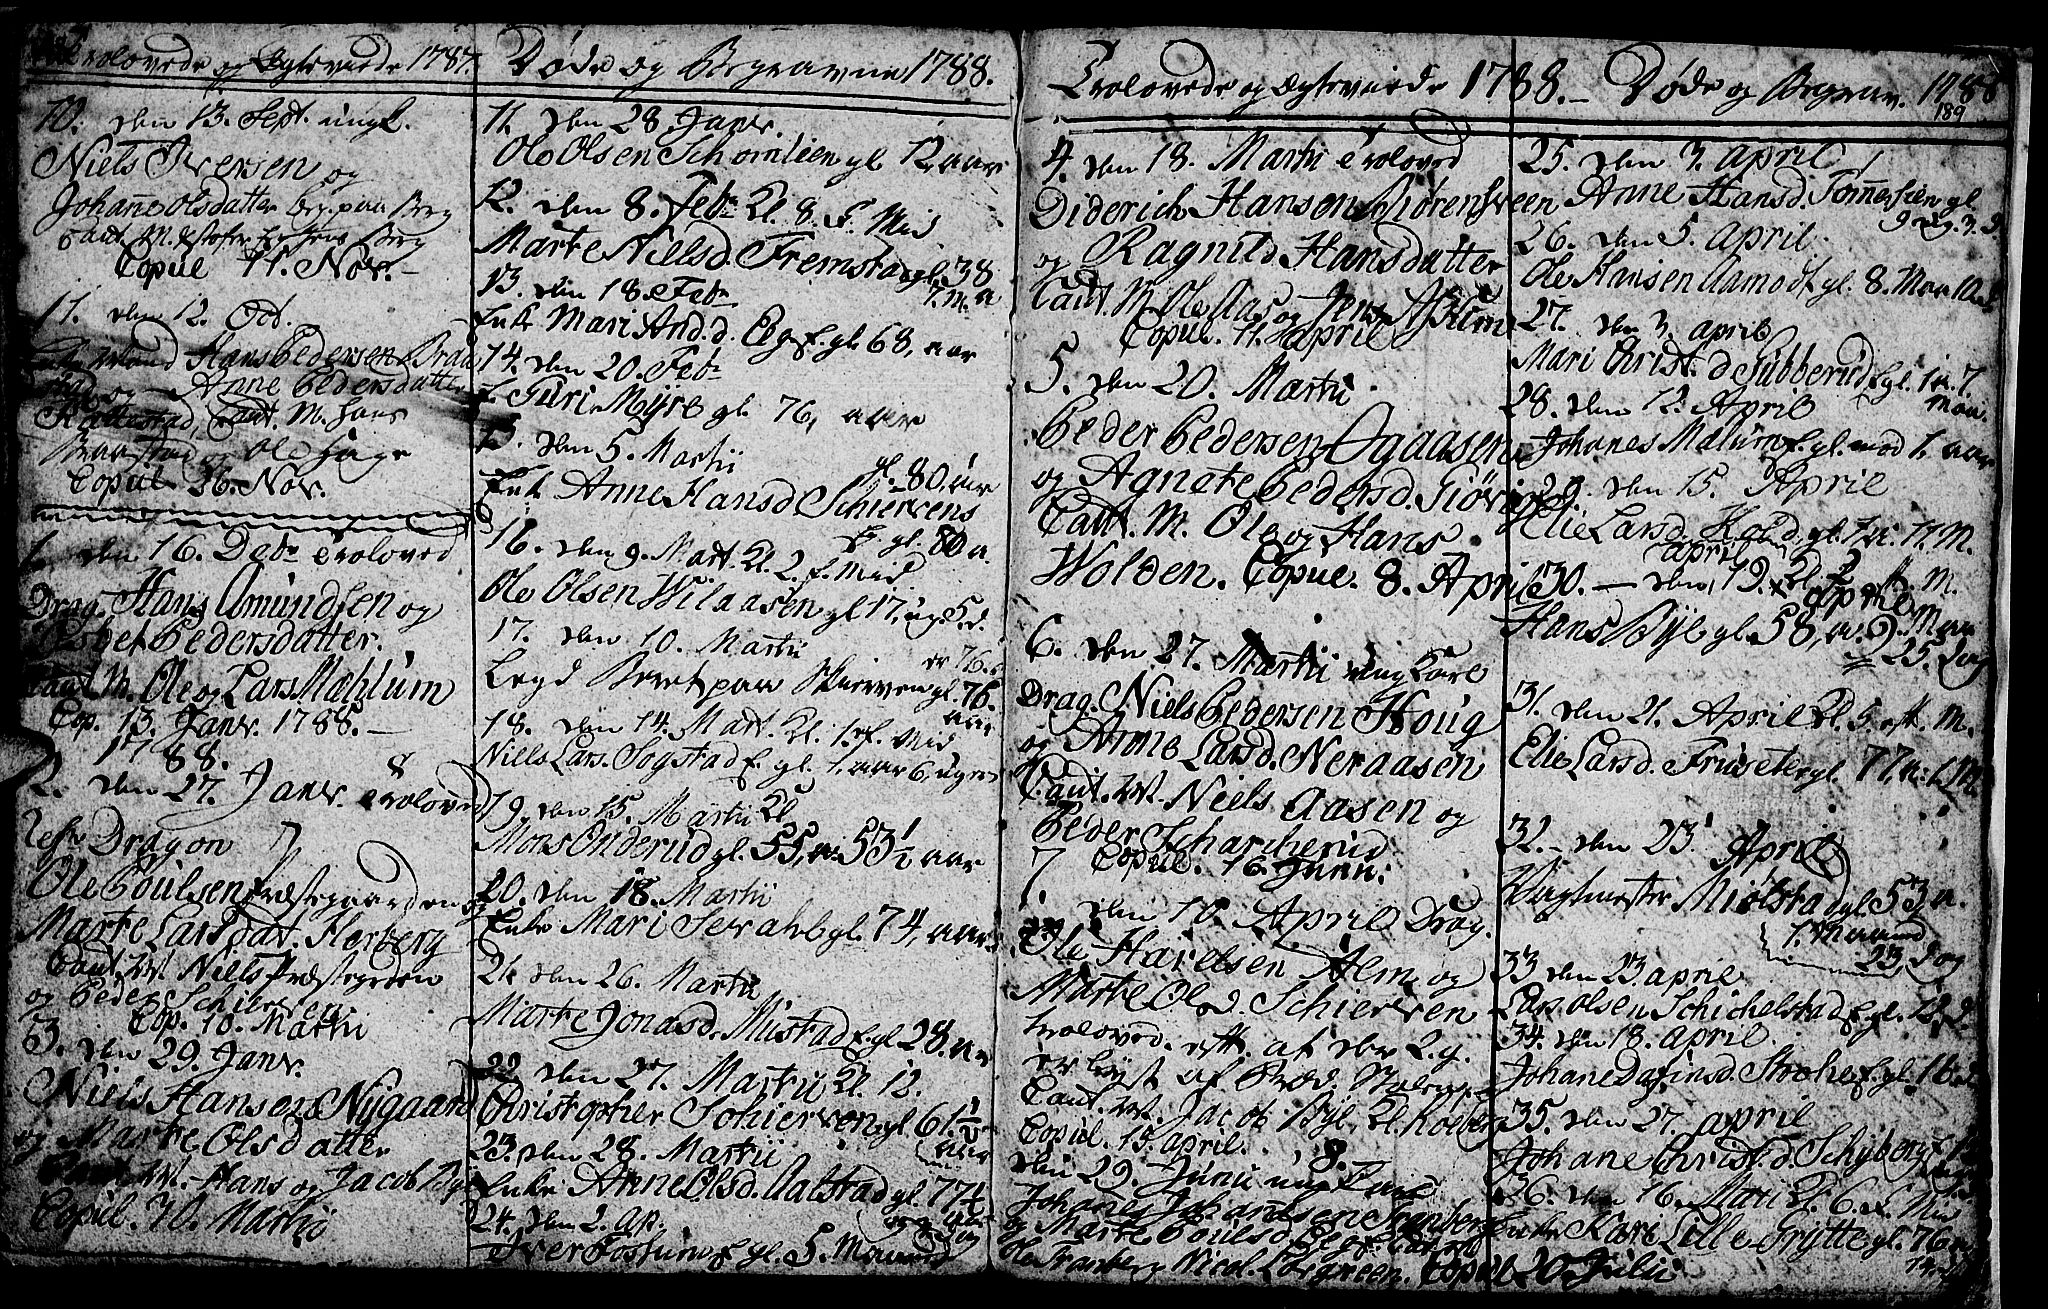 SAH, Vardal prestekontor, H/Ha/Hab/L0001: Klokkerbok nr. 1, 1771-1790, s. 188-189